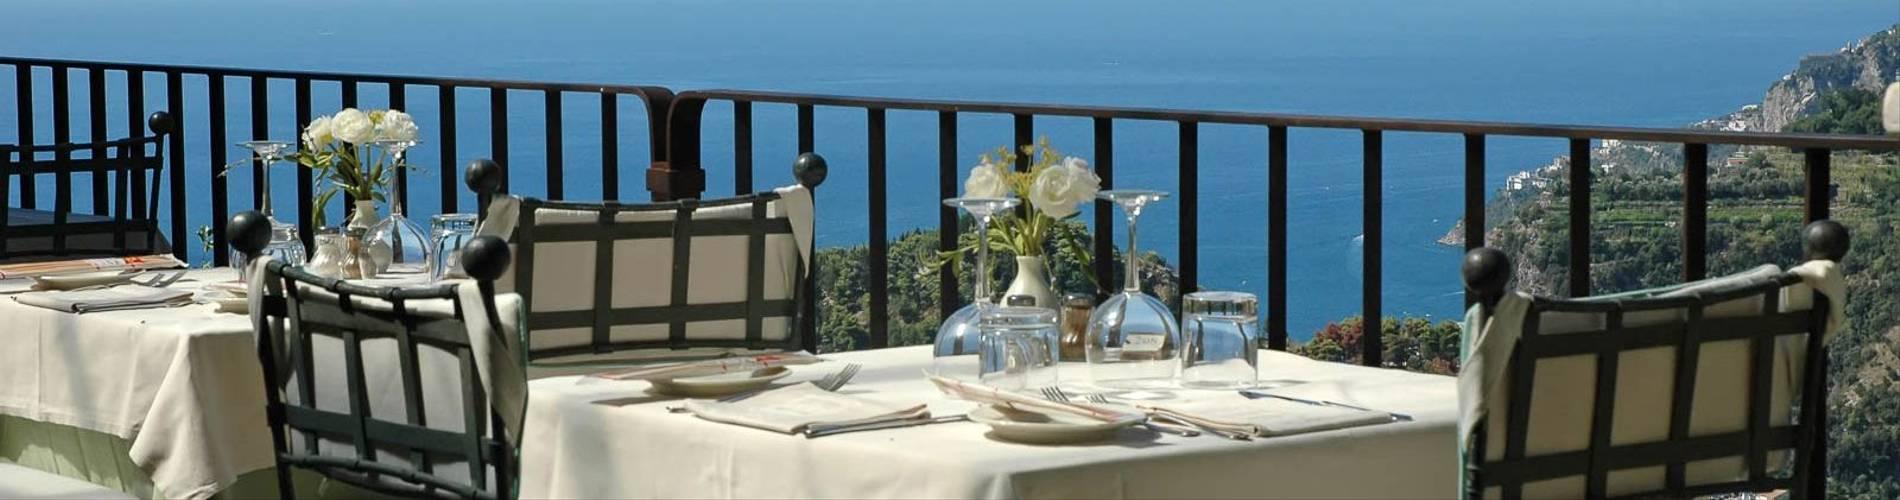 Villa Maria, Amalfi Coast, Italy (6).jpg